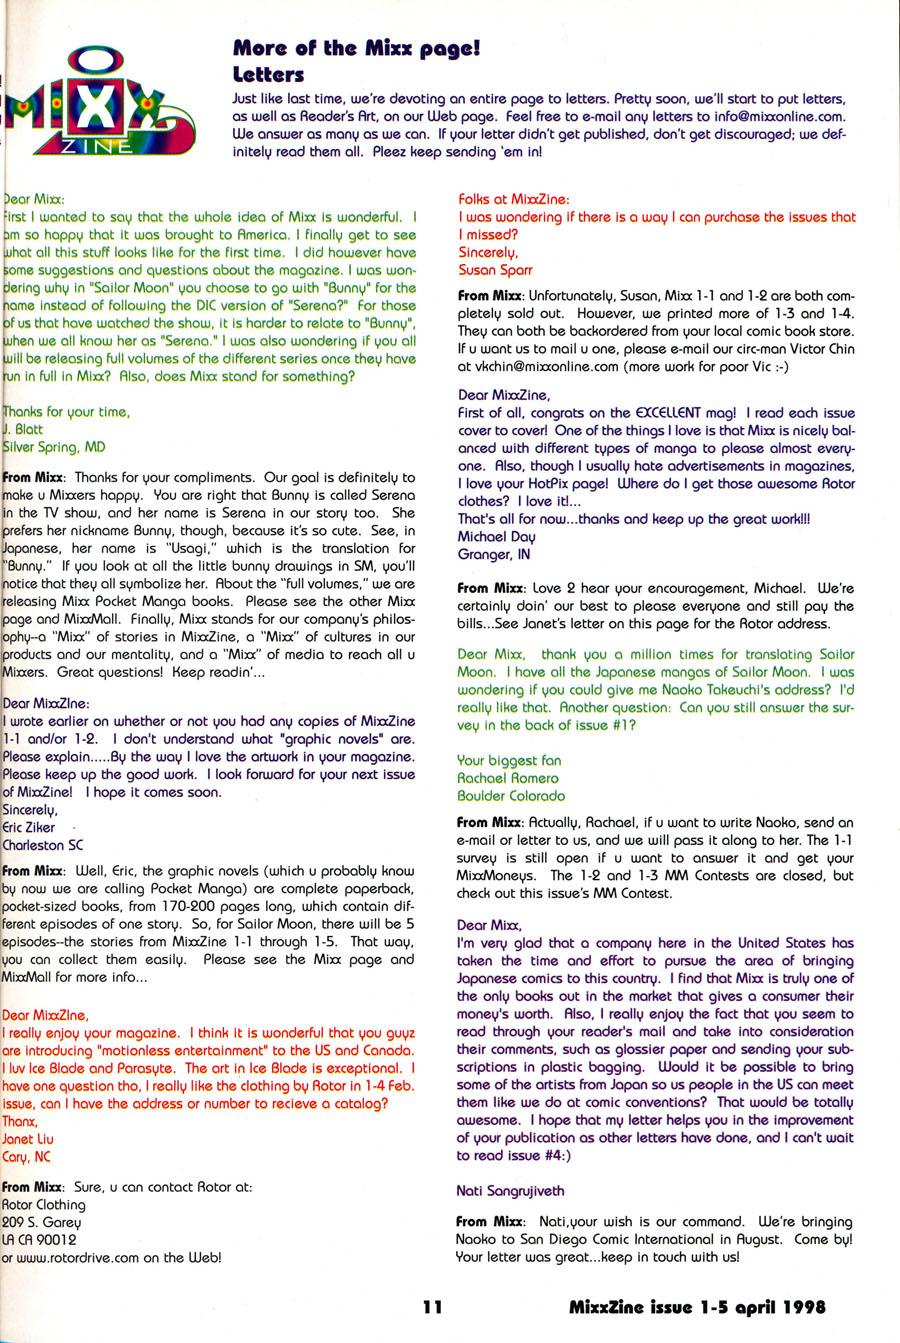 mixx-zine-letters-page